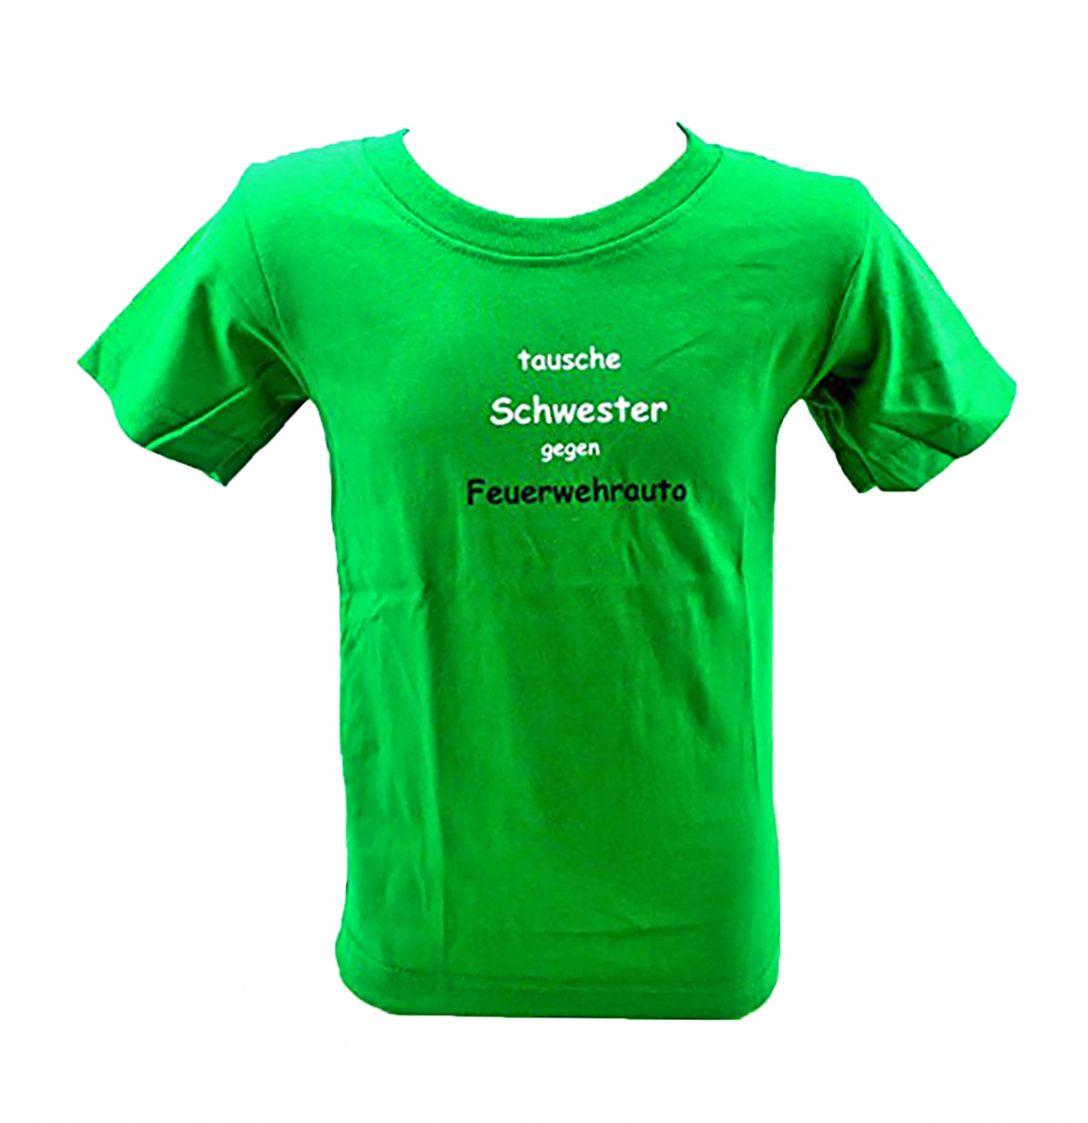 Large Size of Lustige Sprüche T Shirt Männer Sprüche T Shirt Englisch Bayerische Sprüche T Shirt Lustige Sprüche T Shirt Damen Küche Sprüche T Shirt